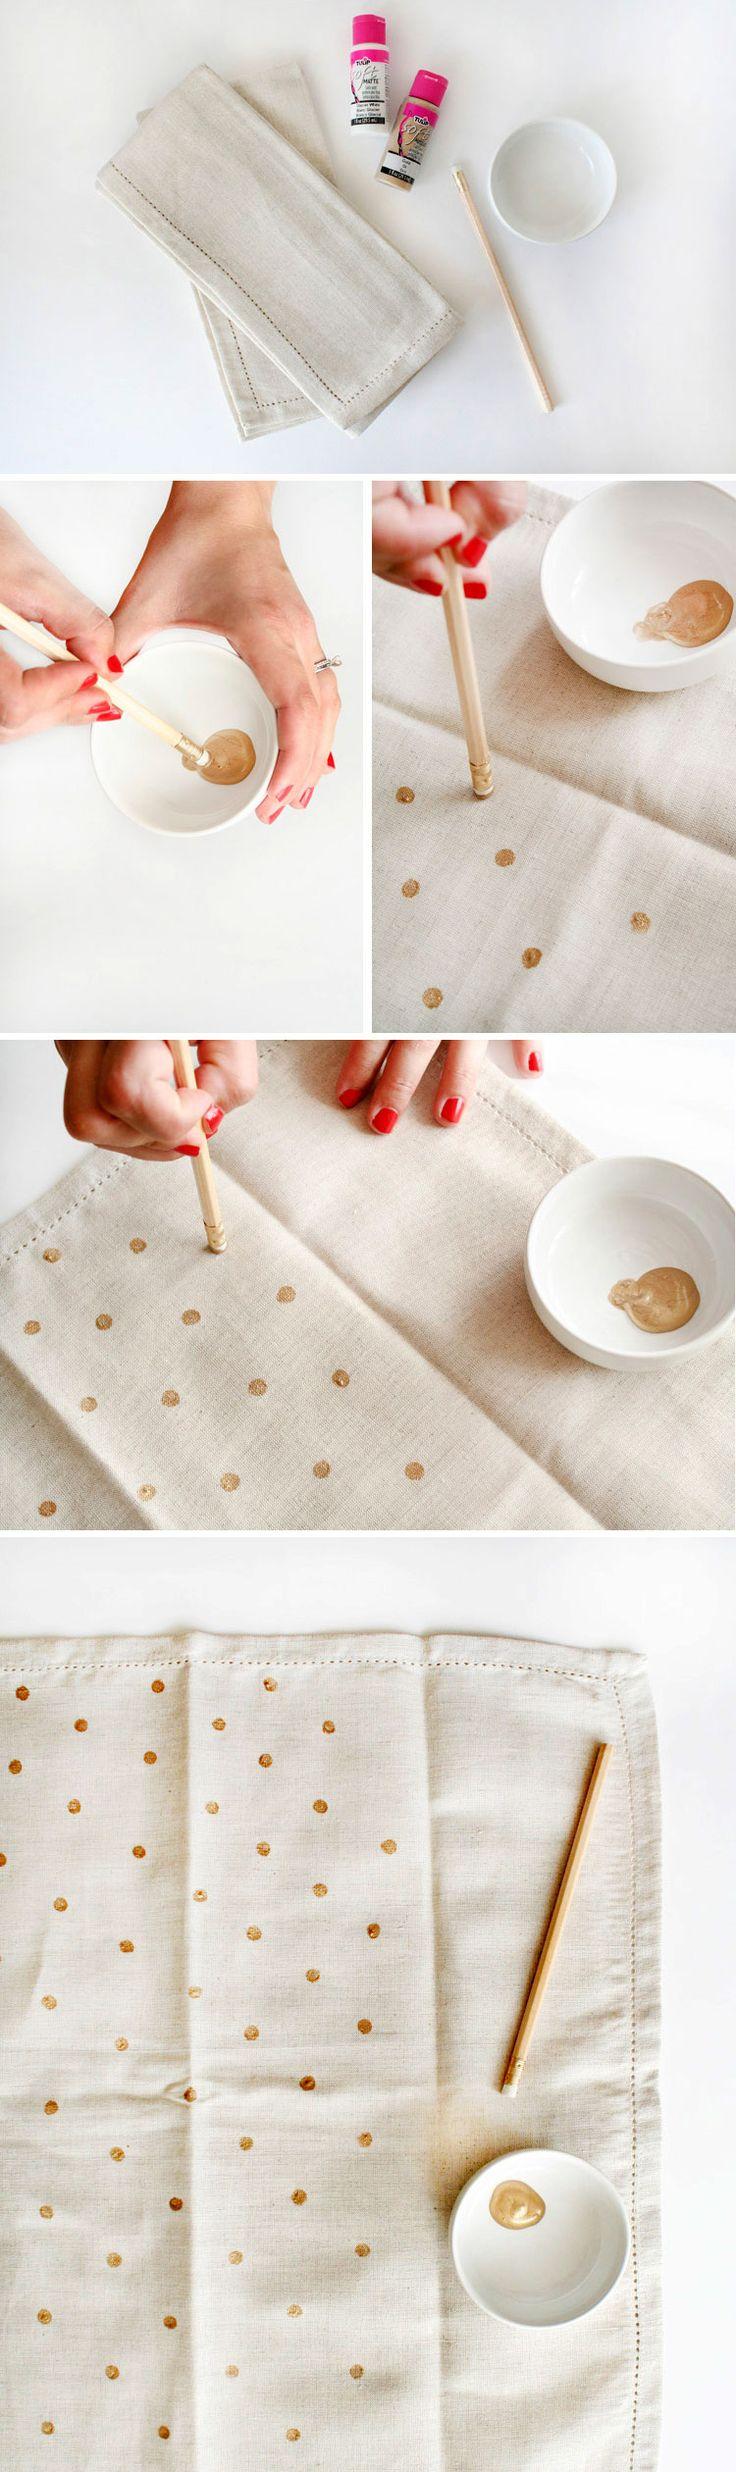 How to DIY Polka Dot Napkins Hostess Gift: DIY Polka Dot Napkins